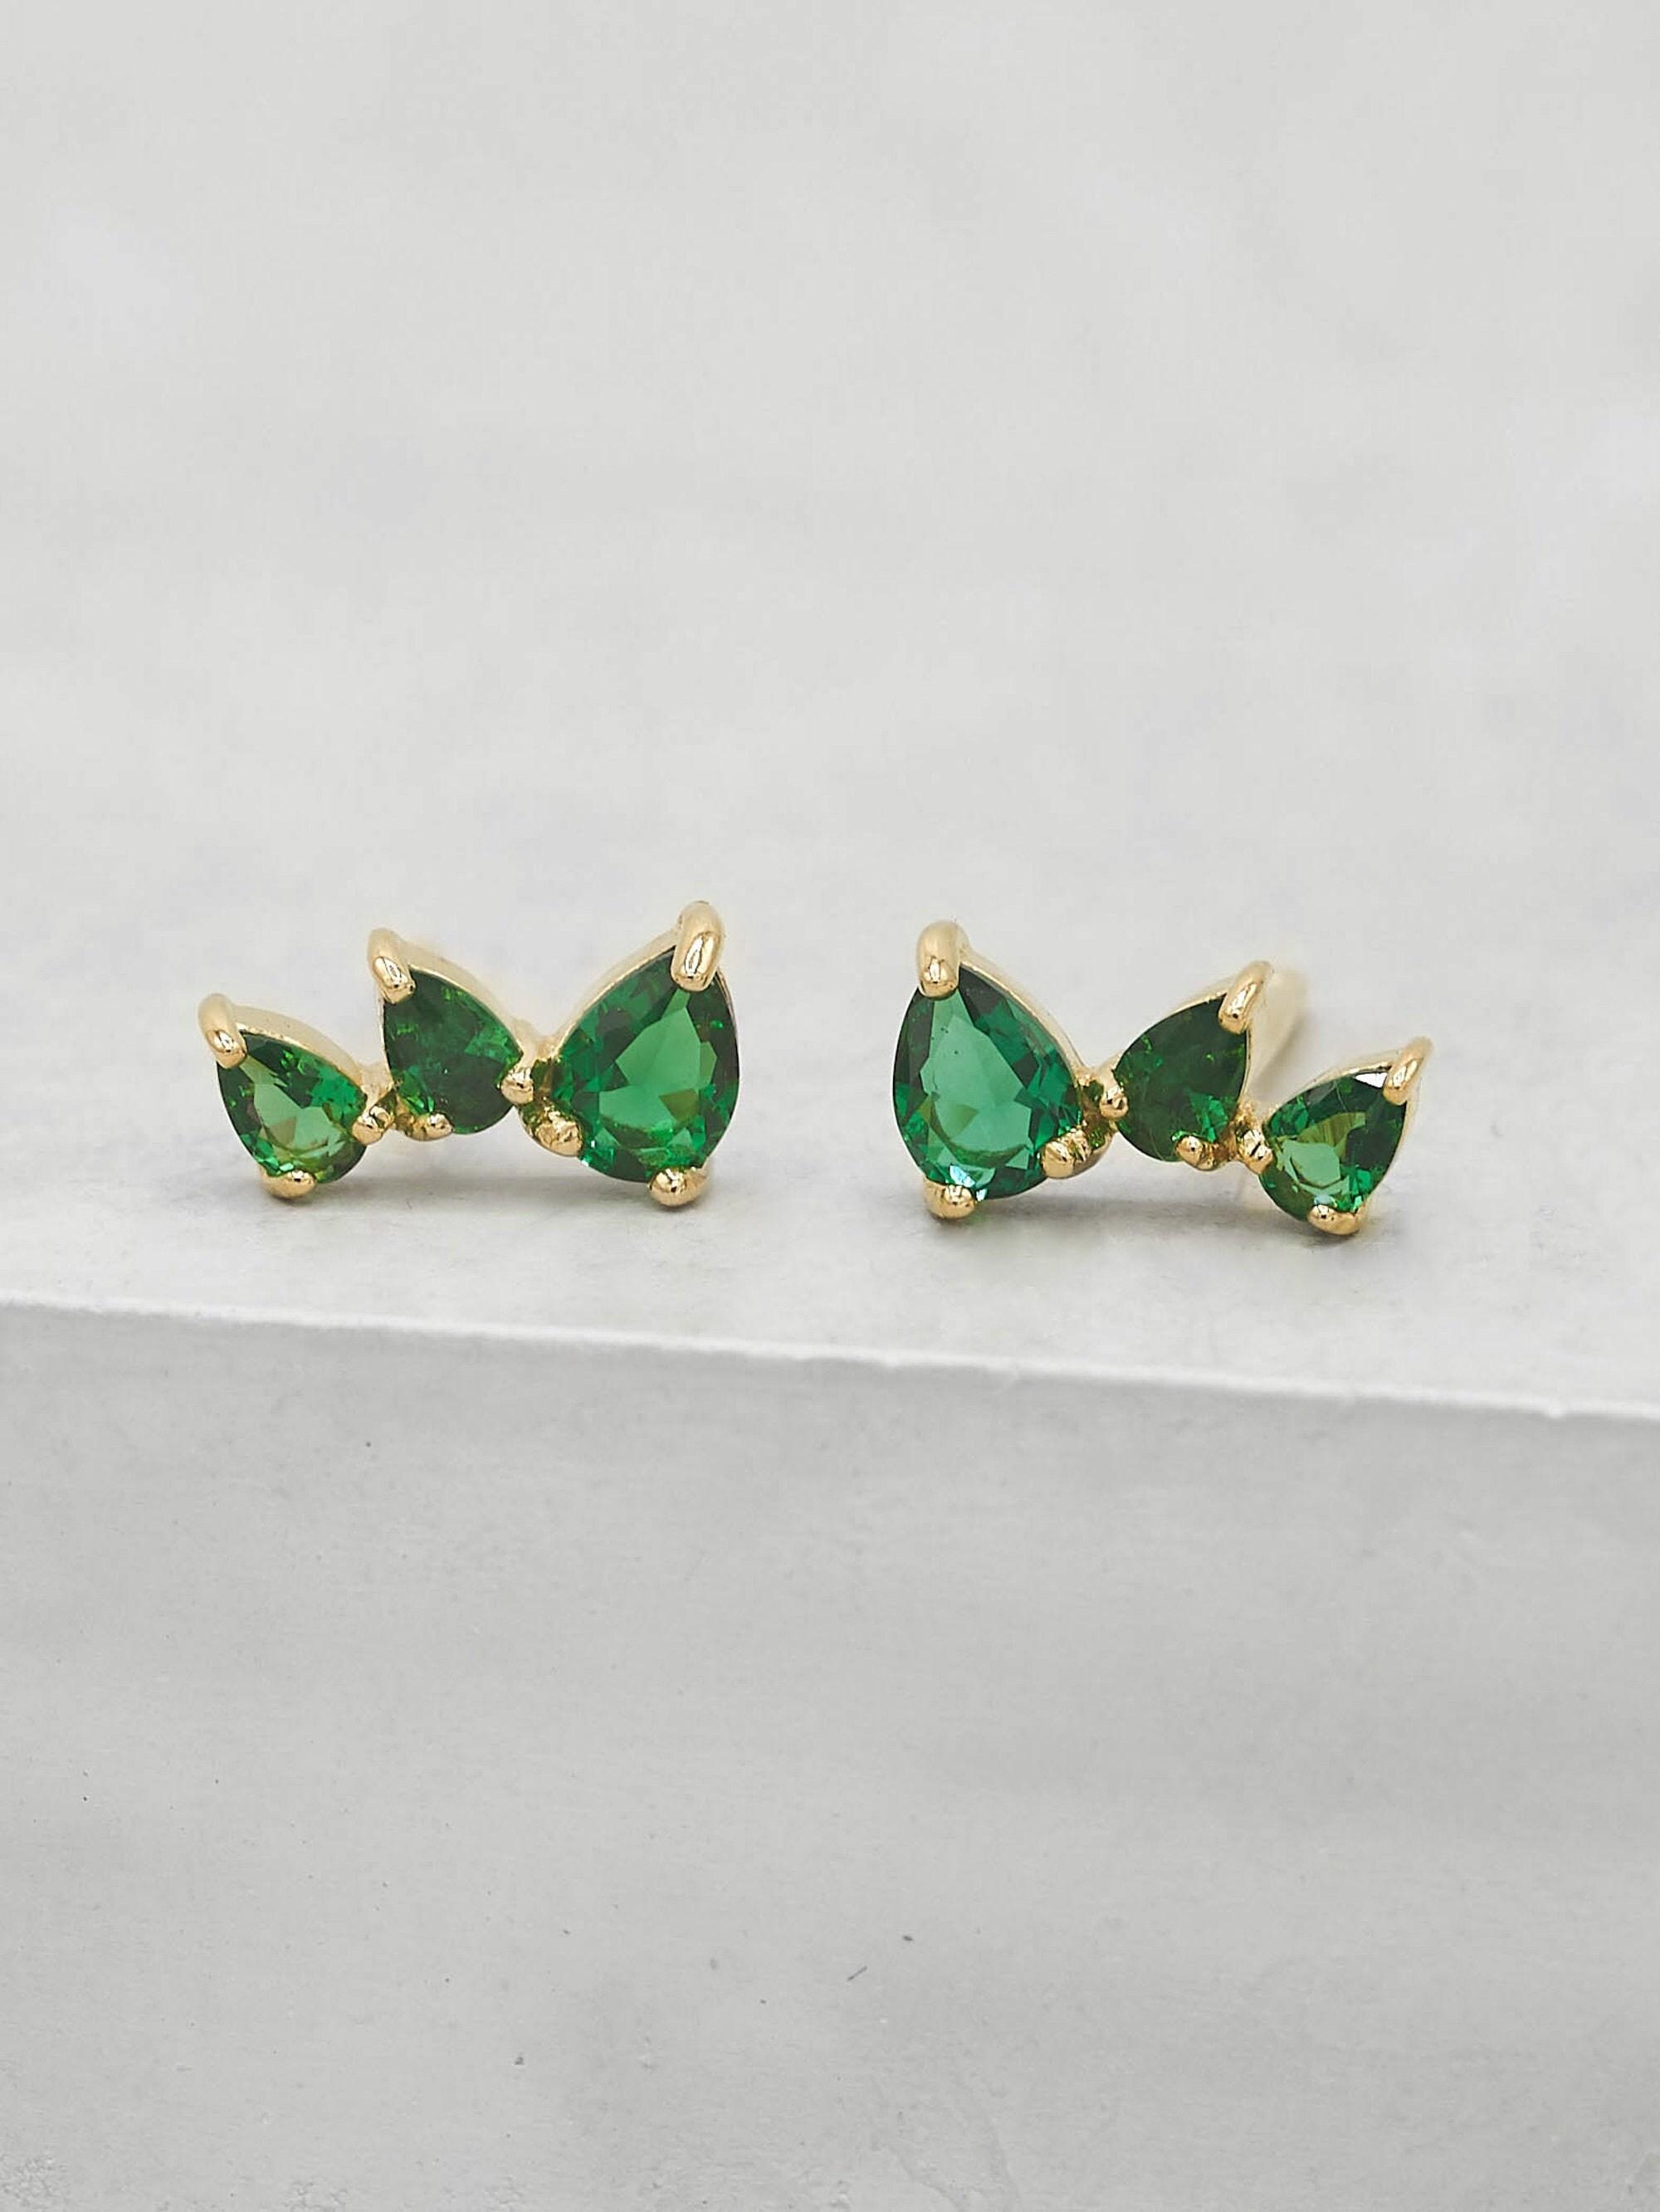 3 Stone Mini Ear crawlers Gold Emerald Studs May Birthstone  E1009GGR Gold Ear Climbers Green Earrings Green Teardrop Crawlers